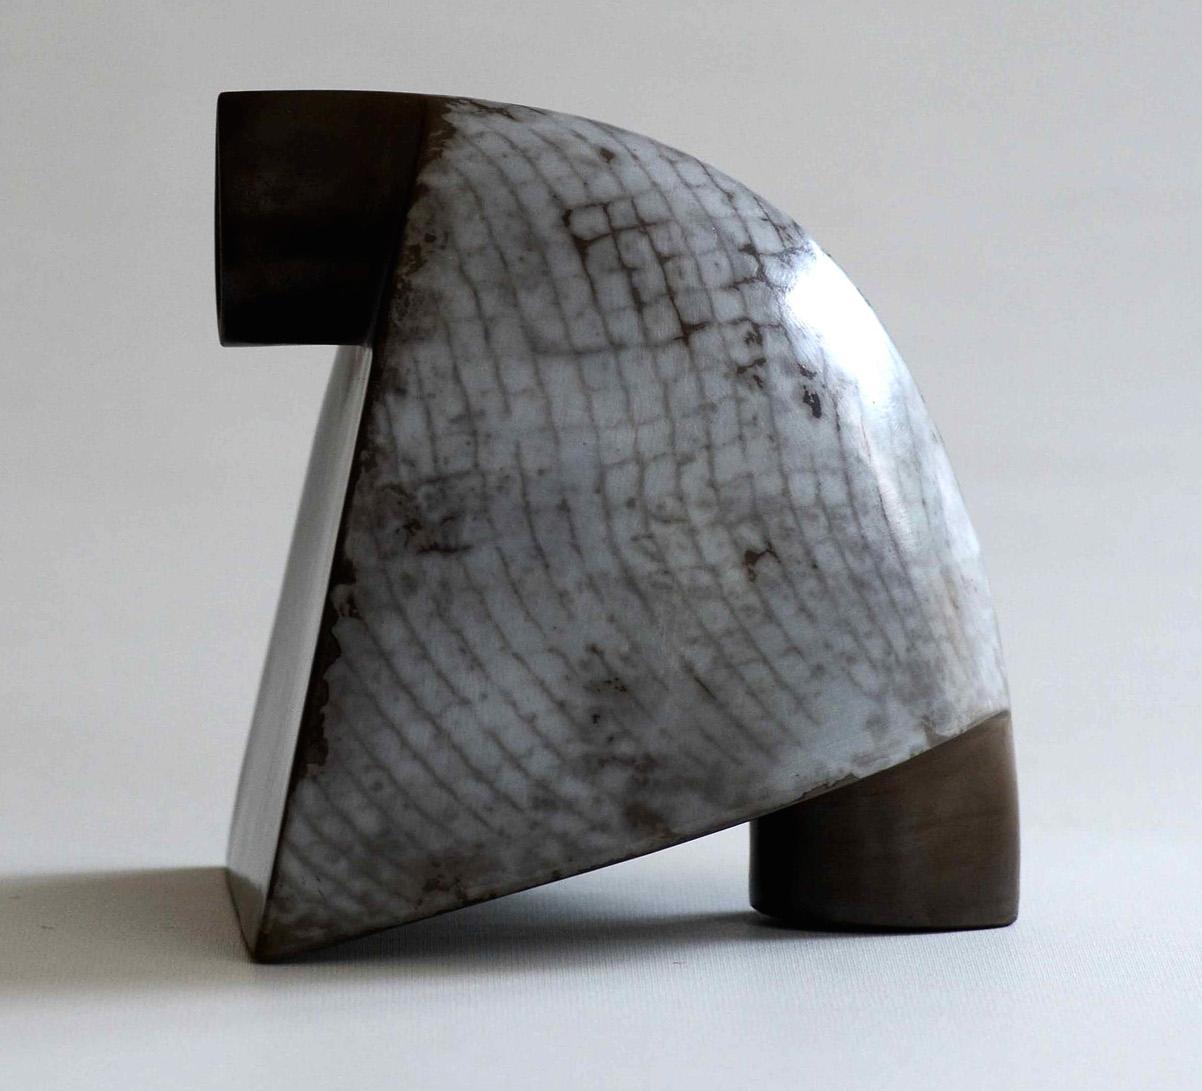 Alison Kay, Heeled Grey Wedge Form, ceramic, 16 x 16 x 11cm, EUR 500